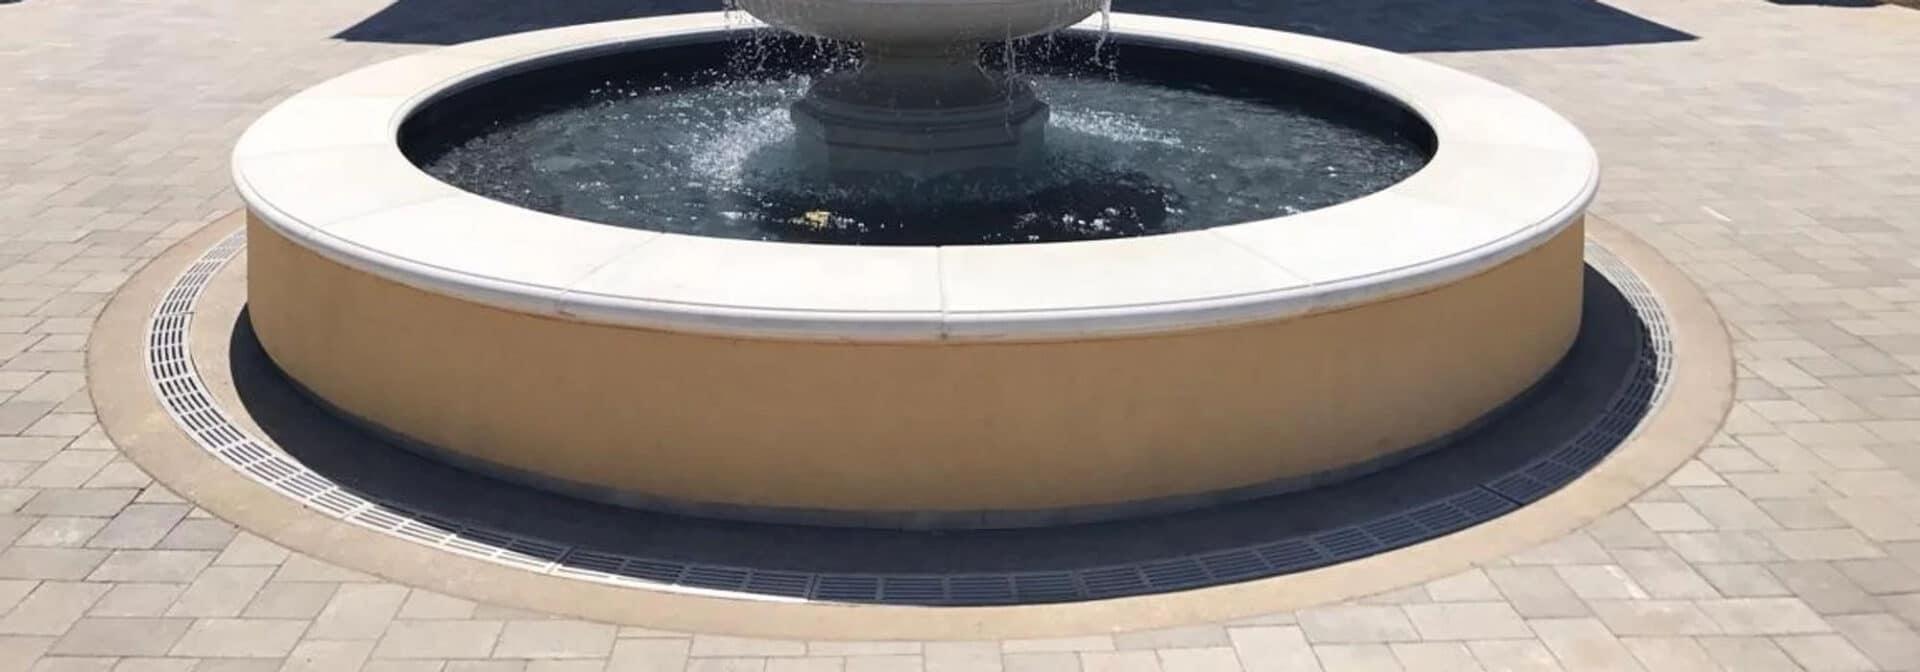 radius trench drain around a water fountain, ada compliant